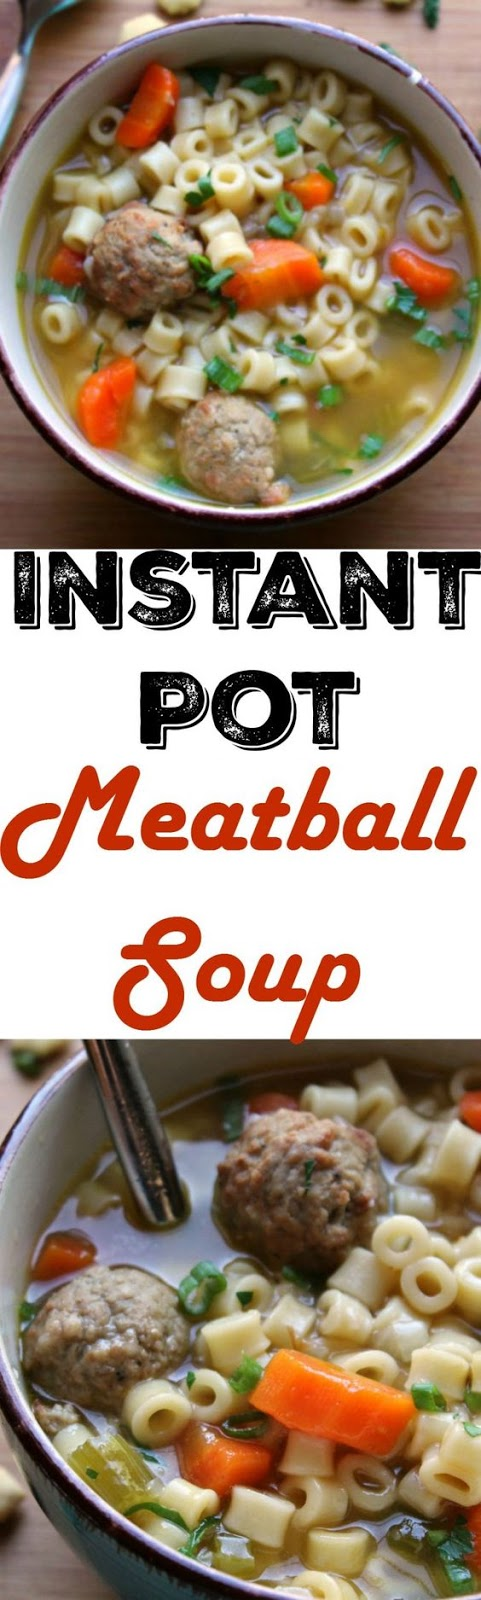 Instant Pot Meatball Soup